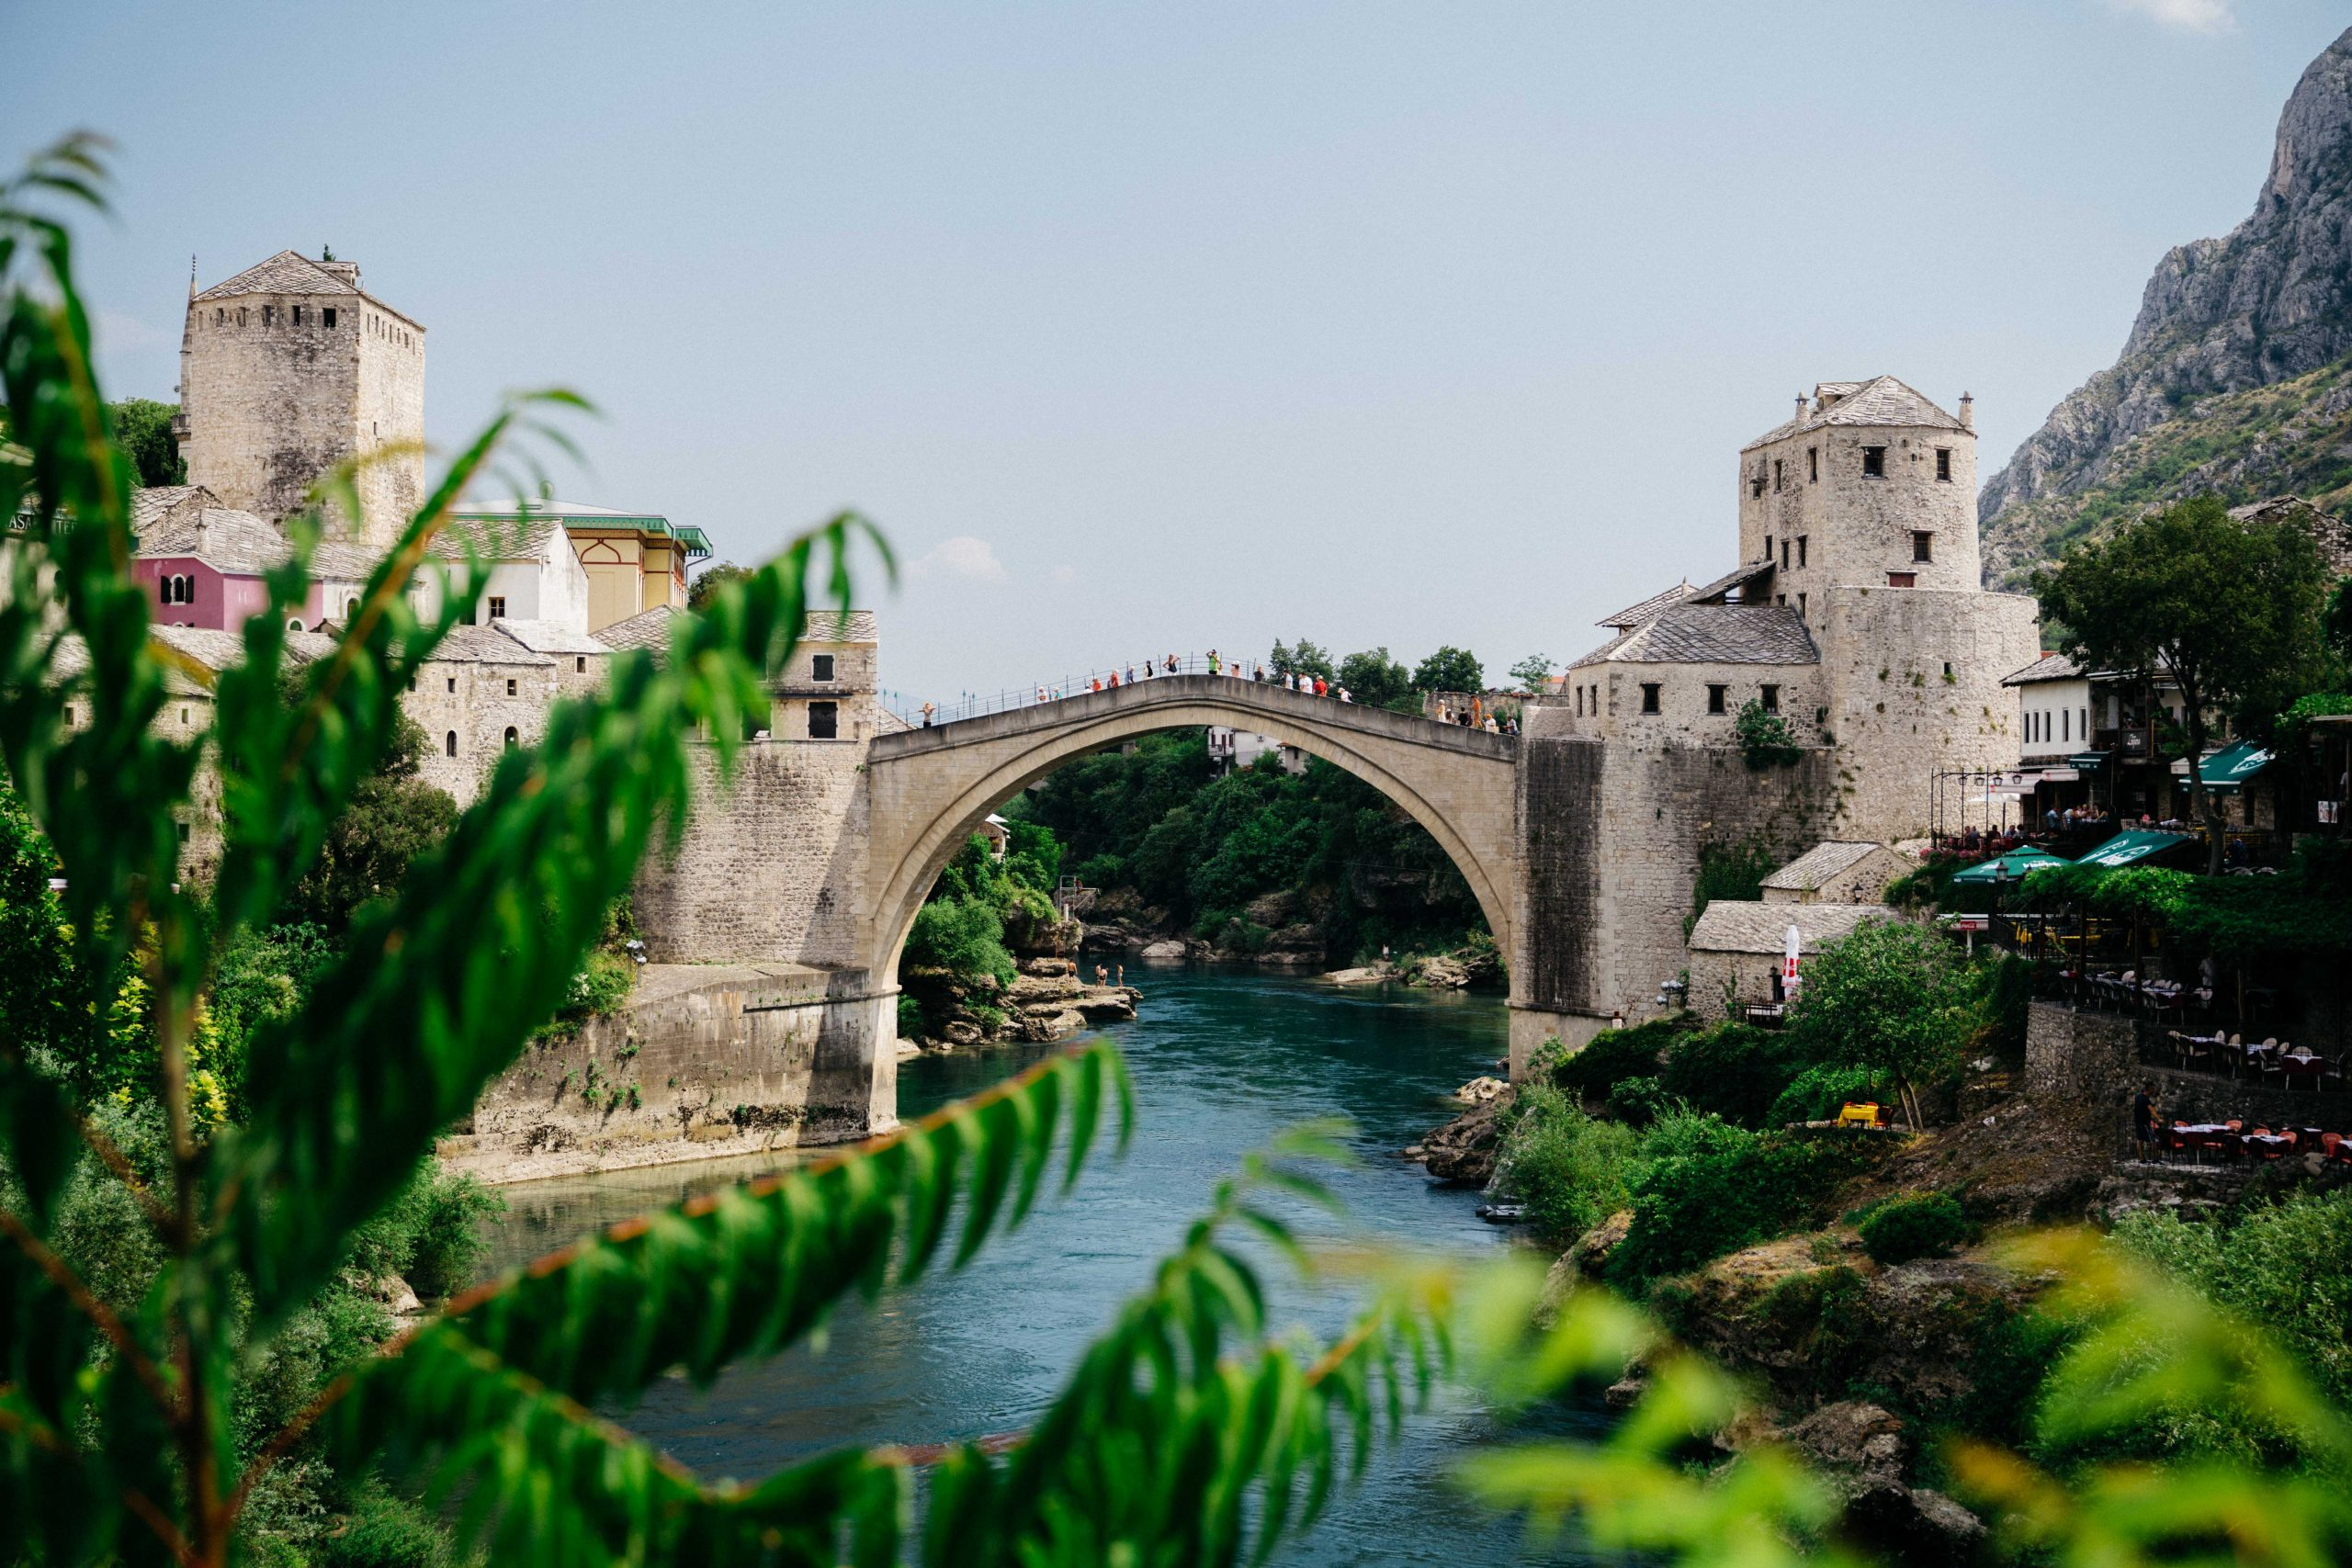 Mostar in Bosnia and Herzegovina.